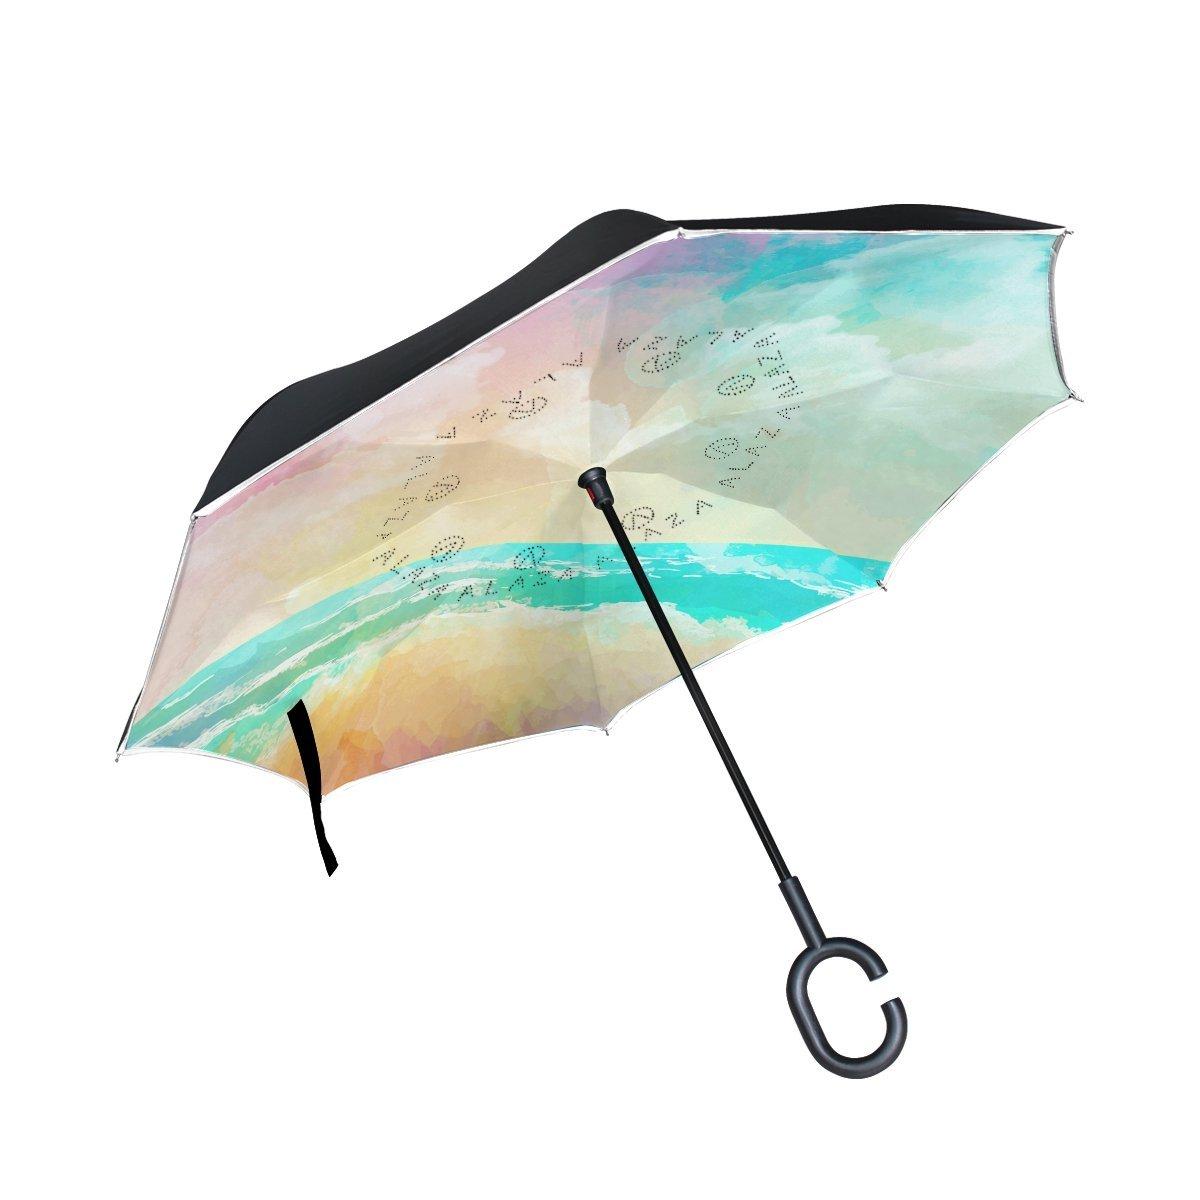 Double Layer Umbrellas Funny Bald Eagles Reverse Folding Umbrella Windproof UV Protection